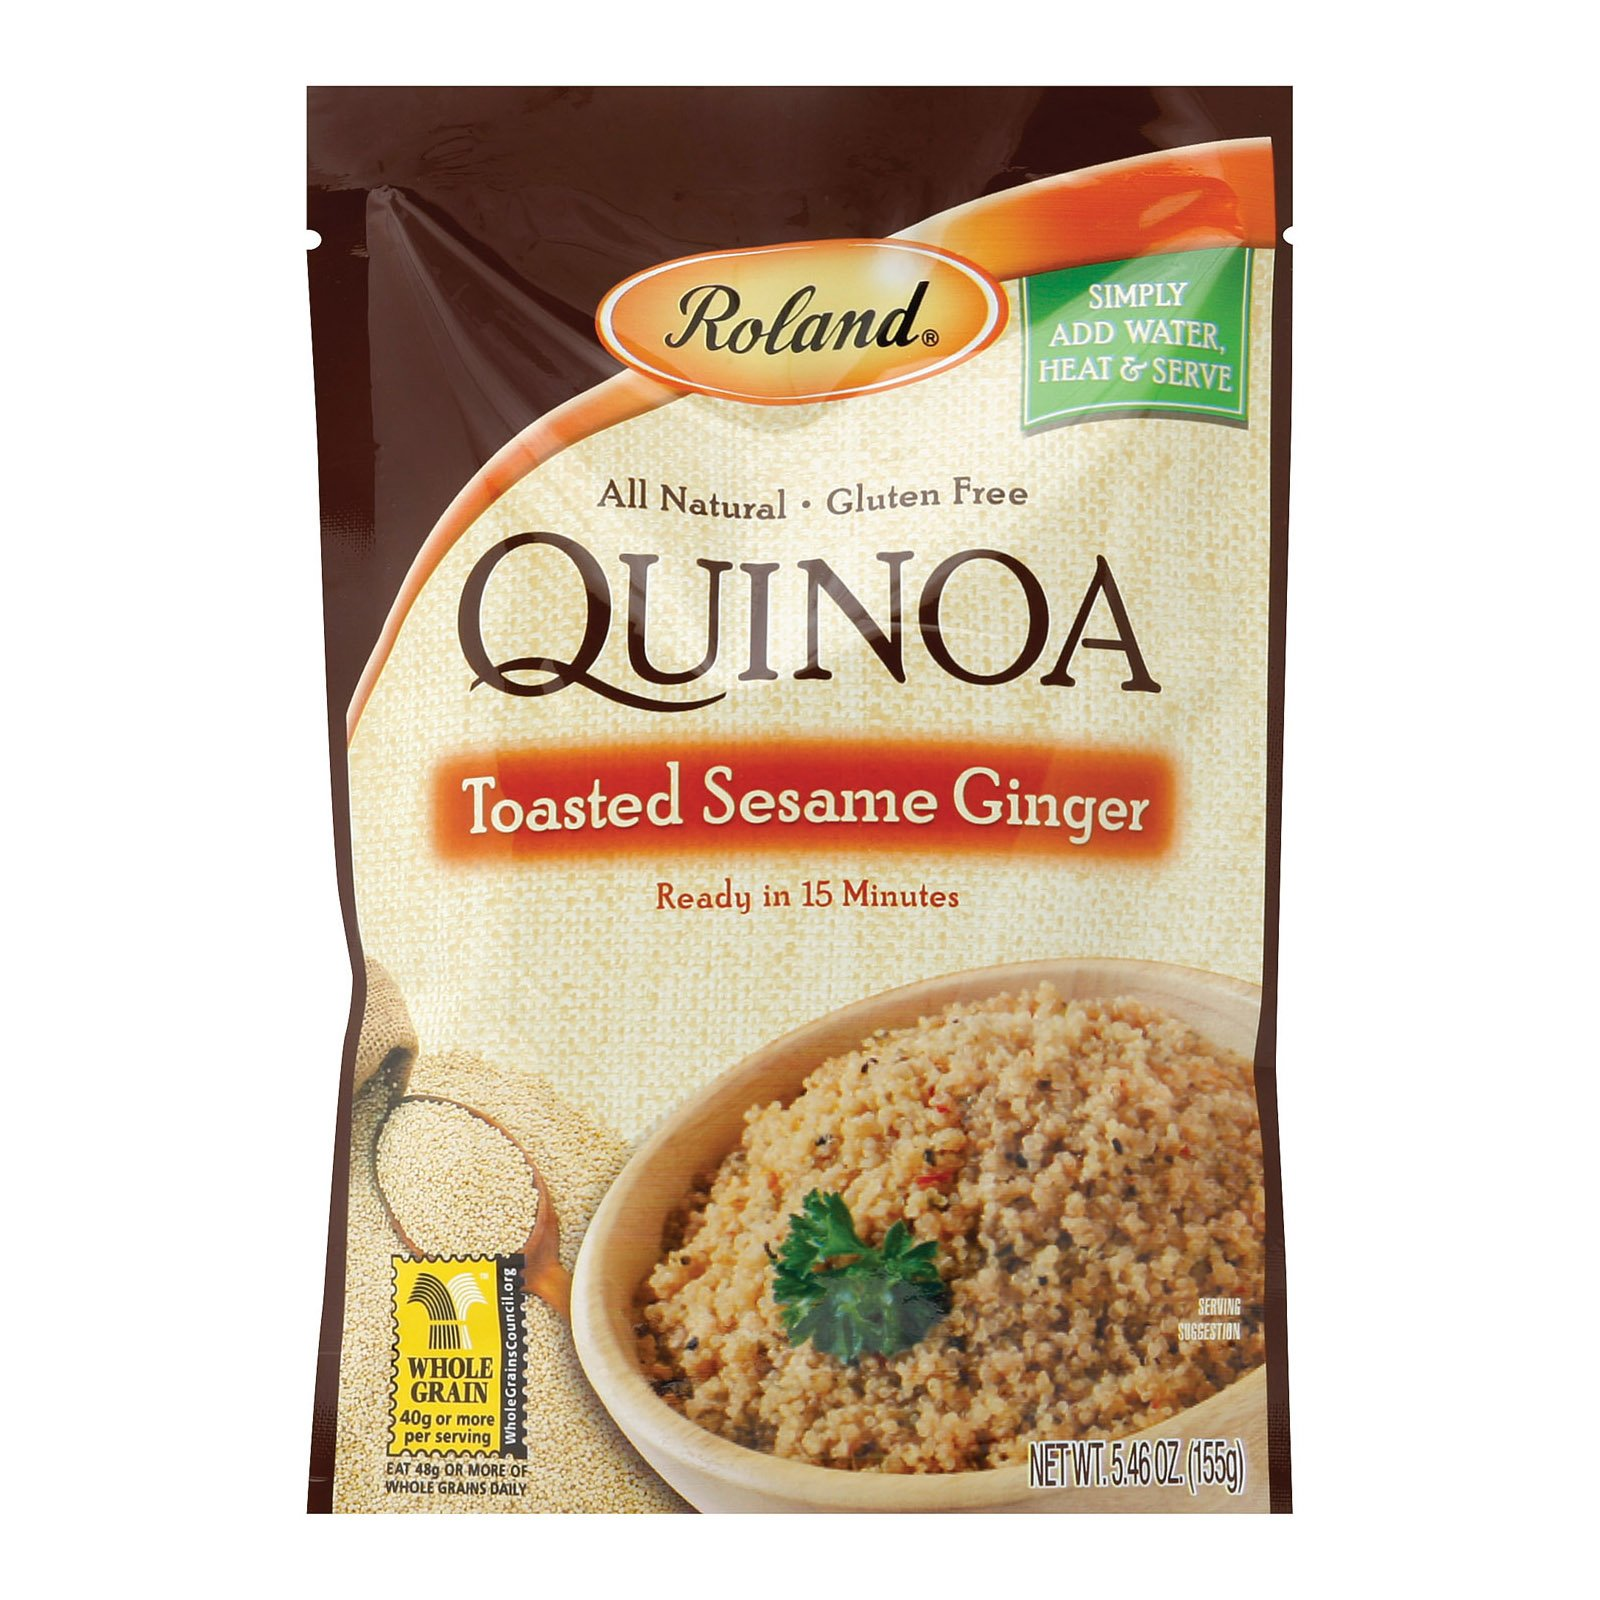 (2 Pack) Roland Toasted Sesame Ginger Quinoa, 5.46 oz